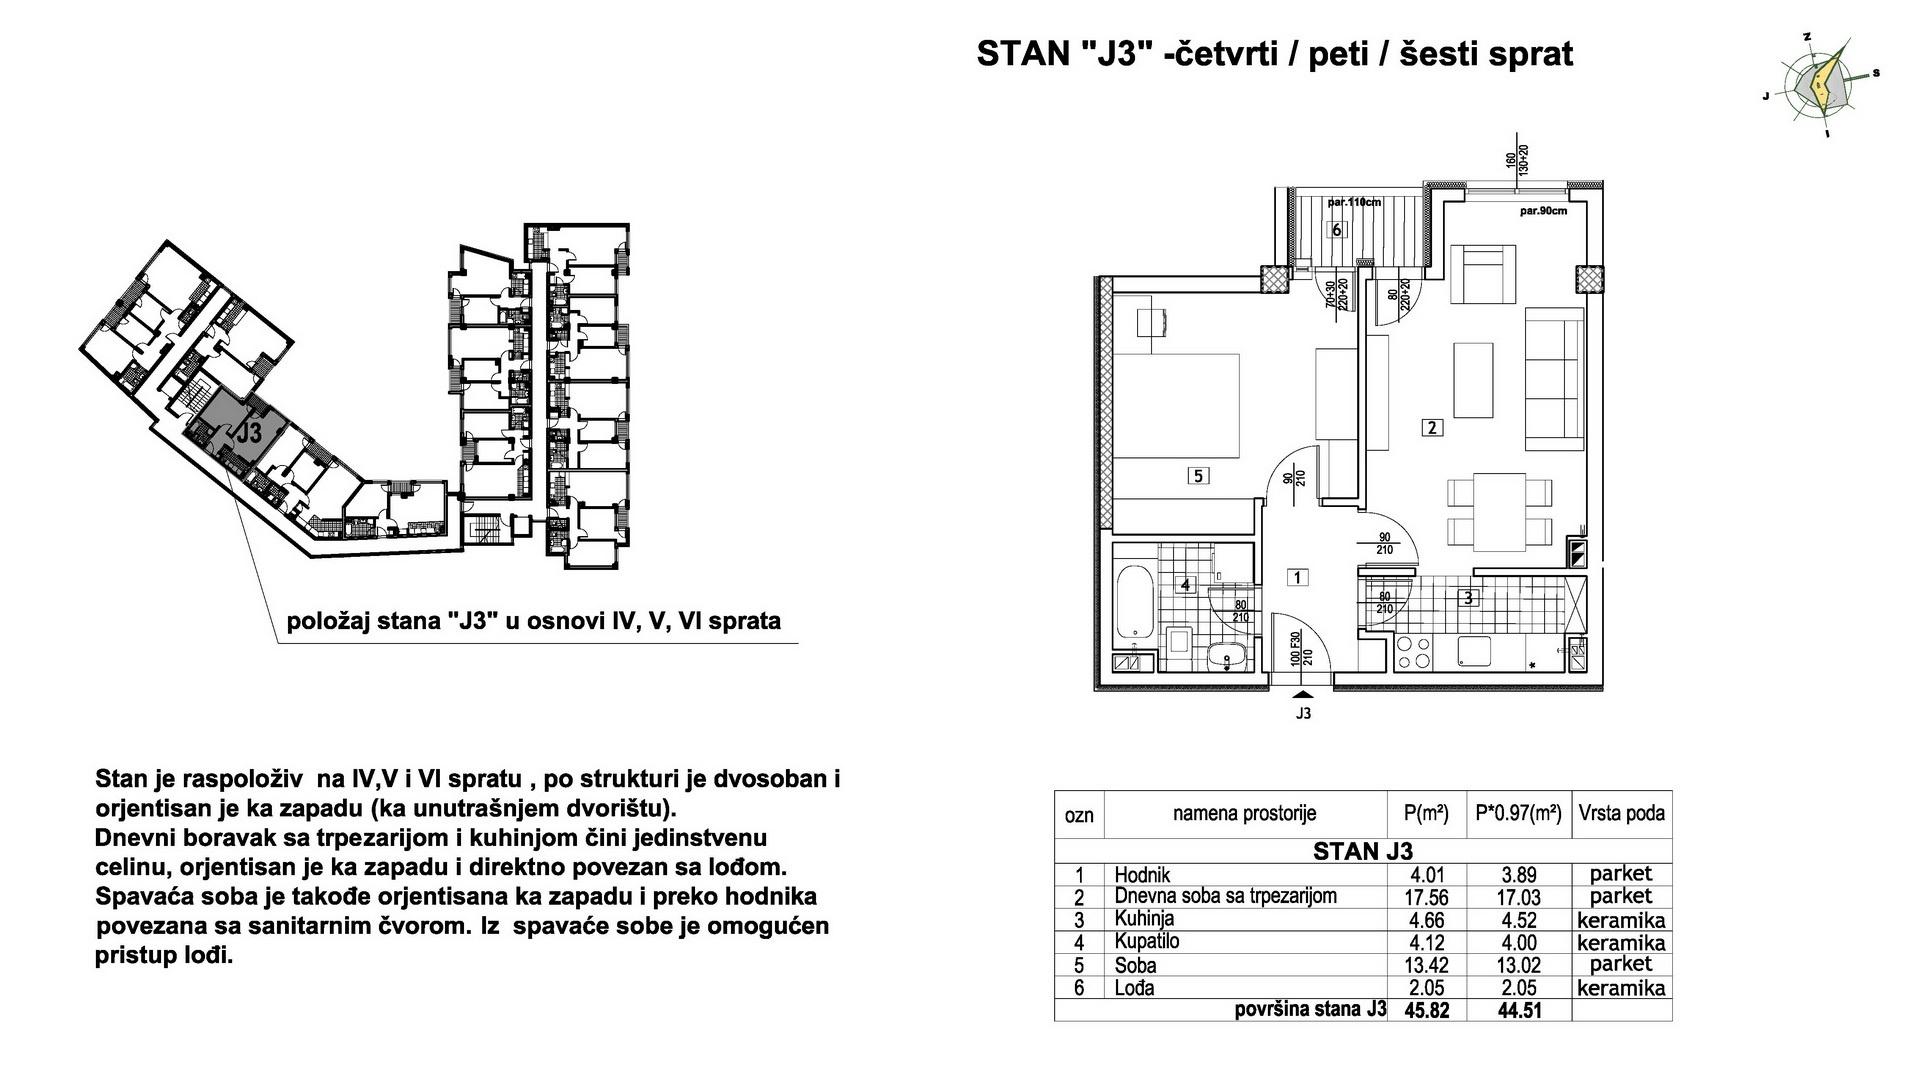 Objekat u Prešernovoj bb - Stan J3